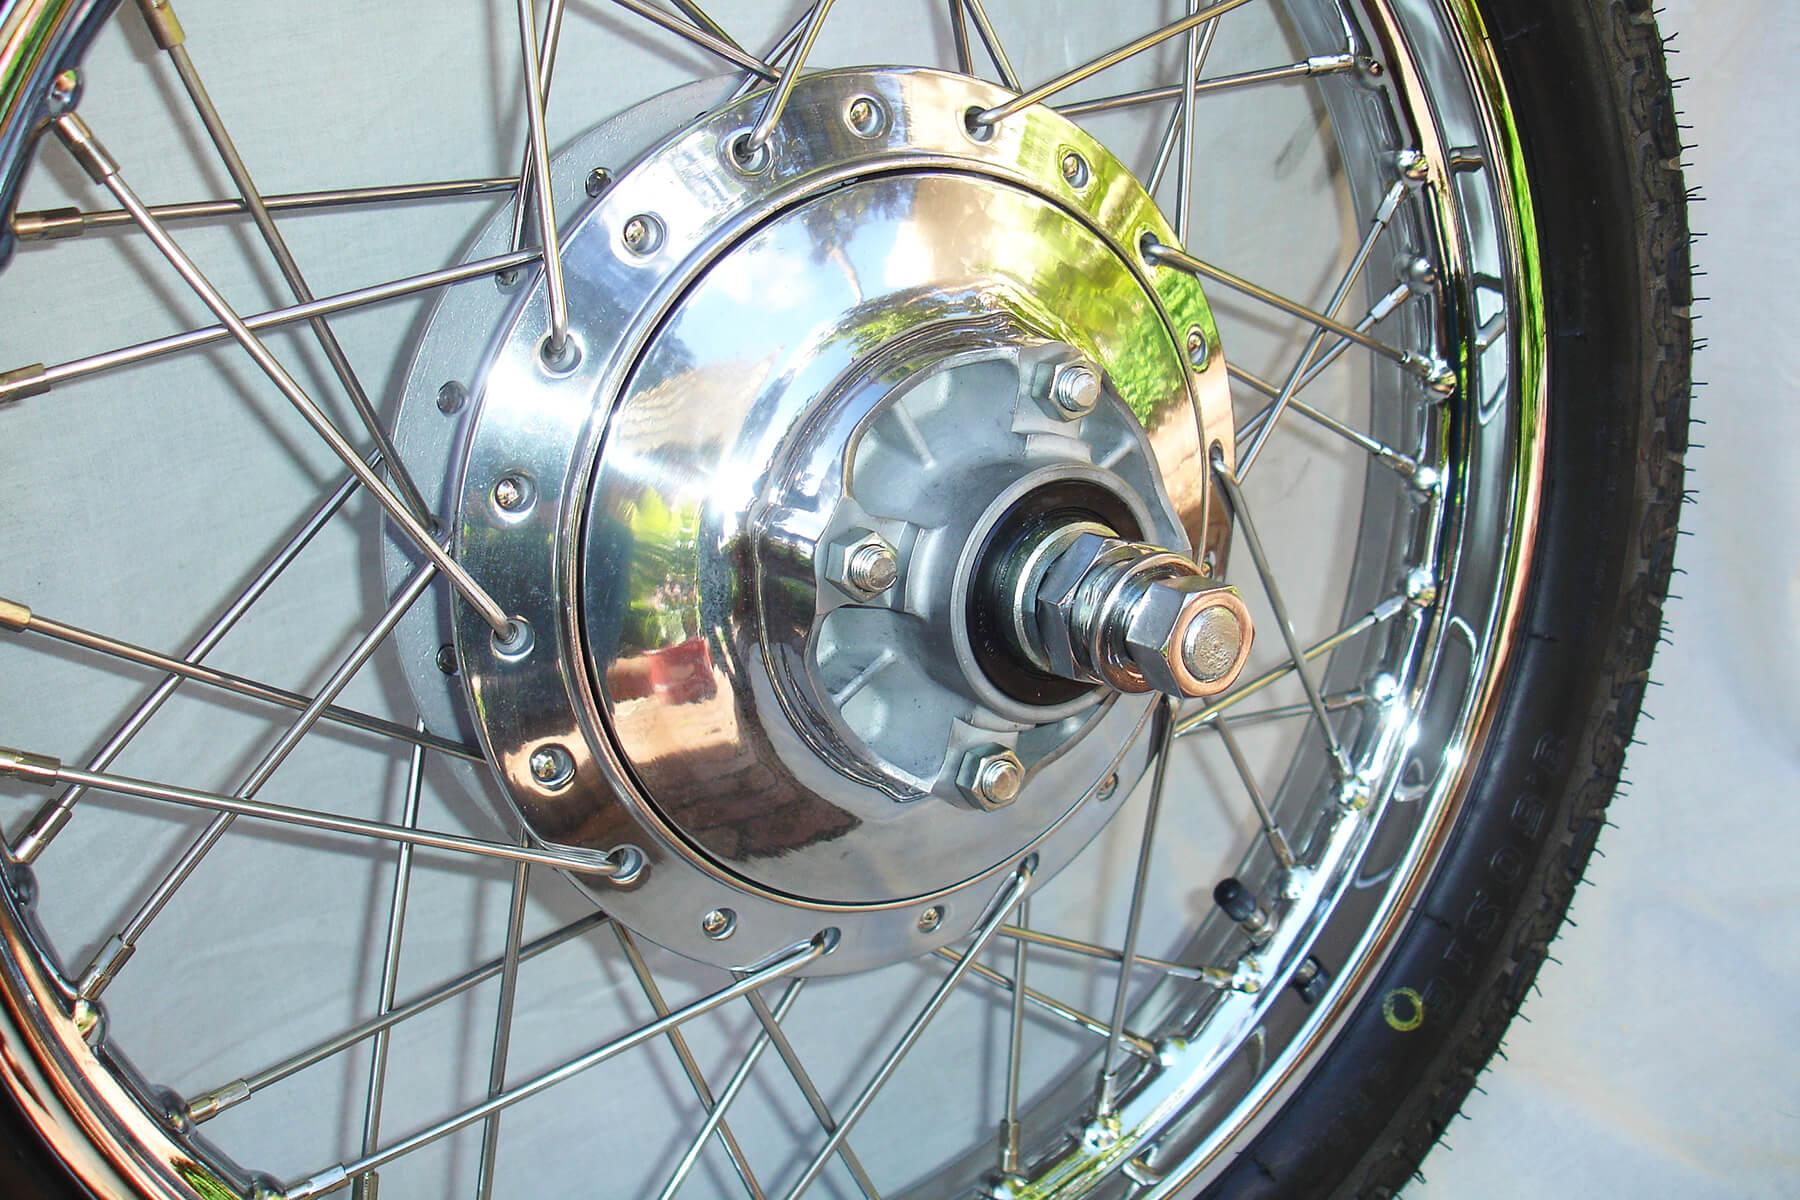 Yamaha rear hub